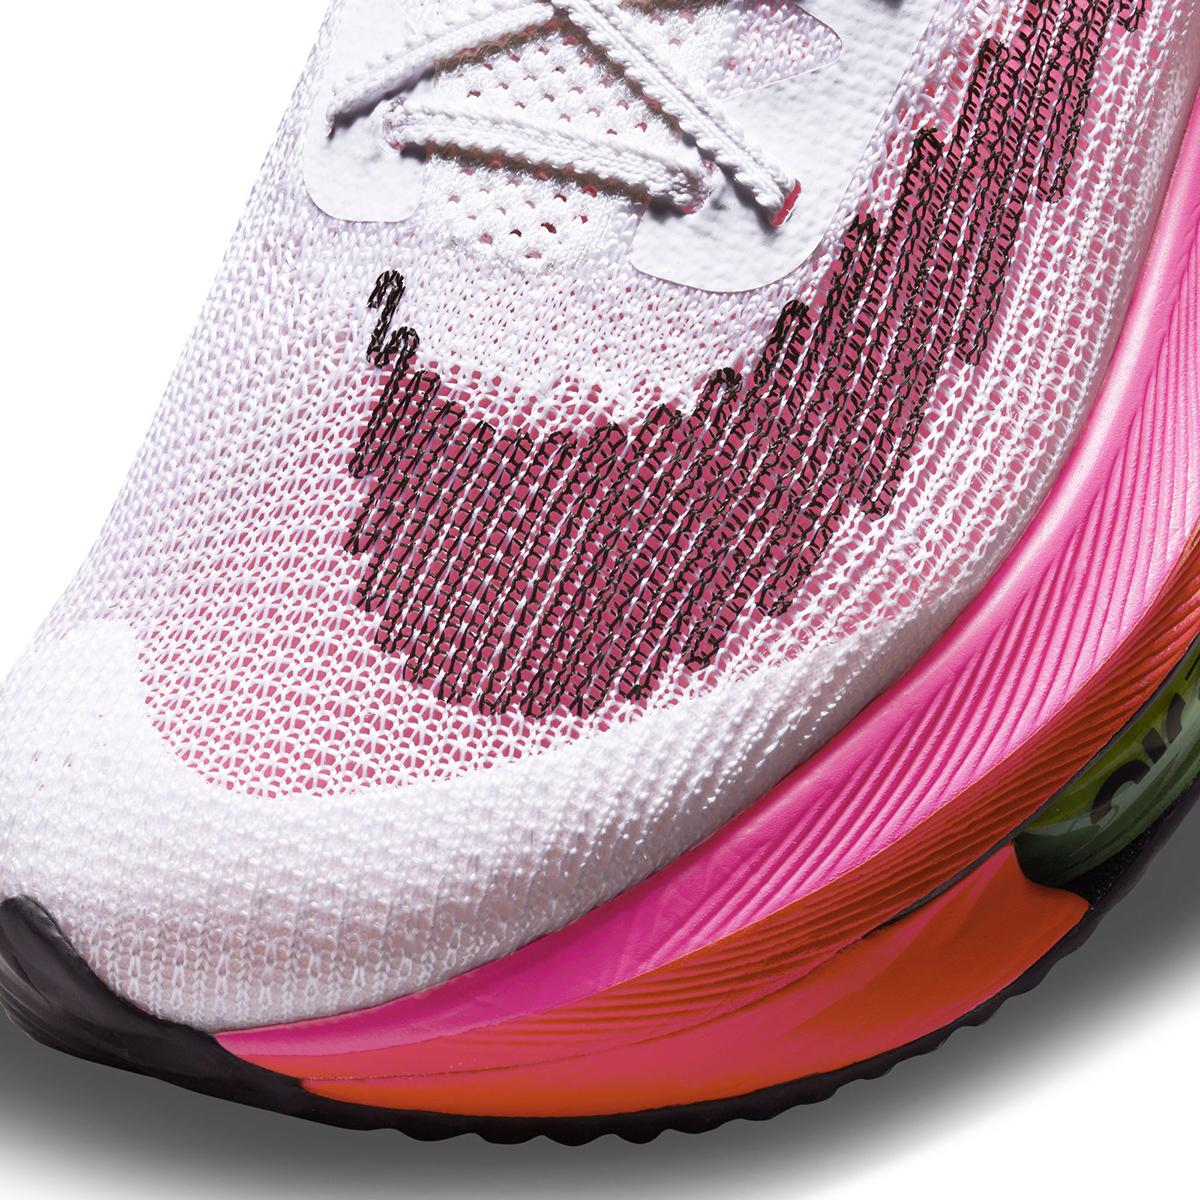 Men's Nike Air Zoom Alphafly Next% Flyknit Running Shoe - Color: Rawdacious - Size: 6 - Width: Regular, Rawdacious, large, image 7